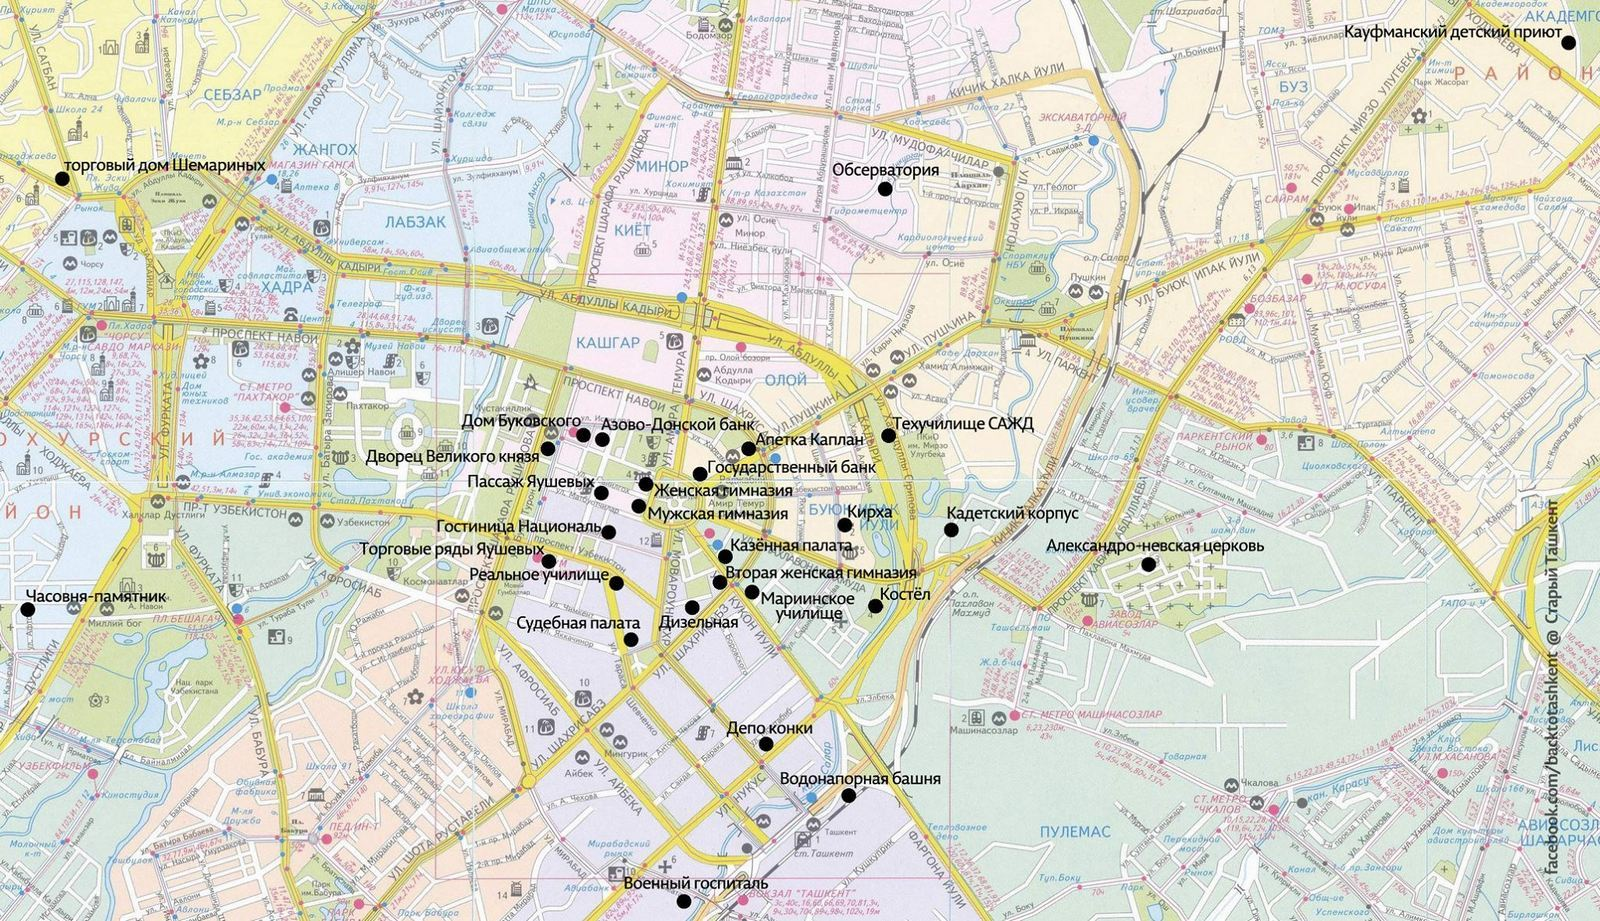 фото карта ташкент вот откуда основном